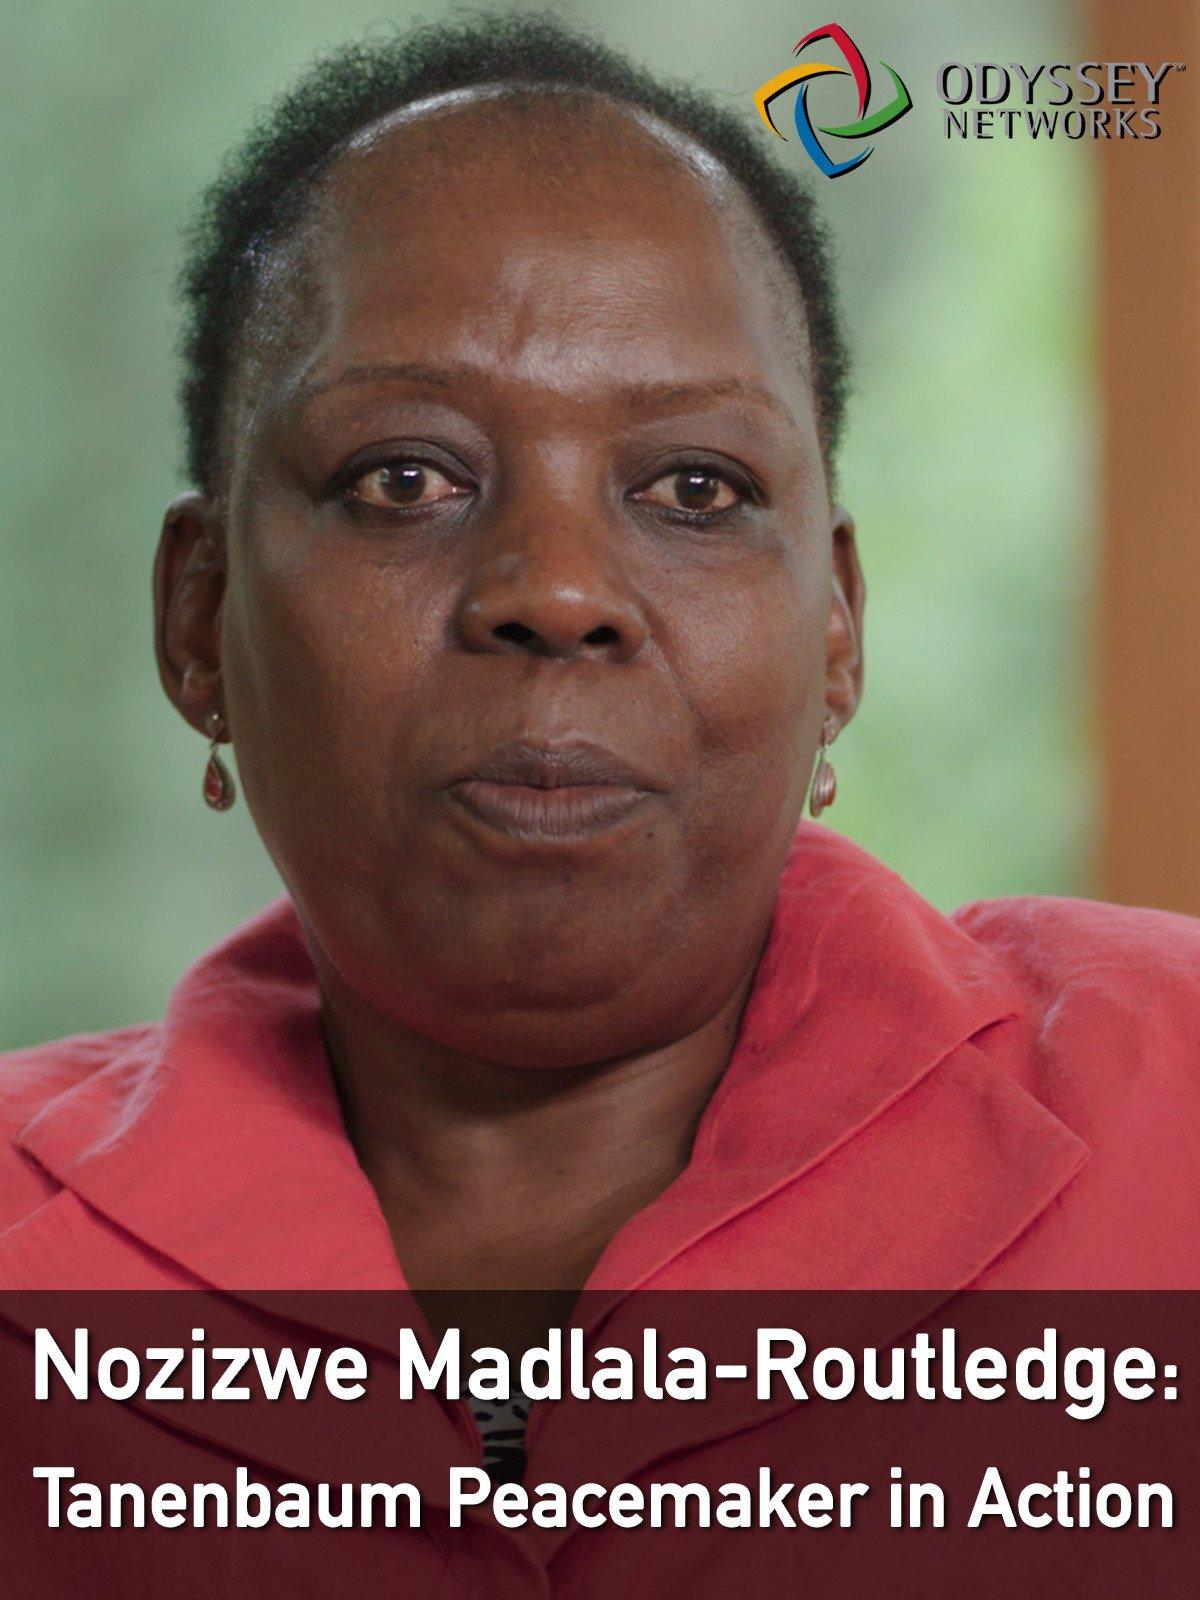 Clip: Nozizwe Madlala-Routledge: Tanenbaum Peacemaker in Action